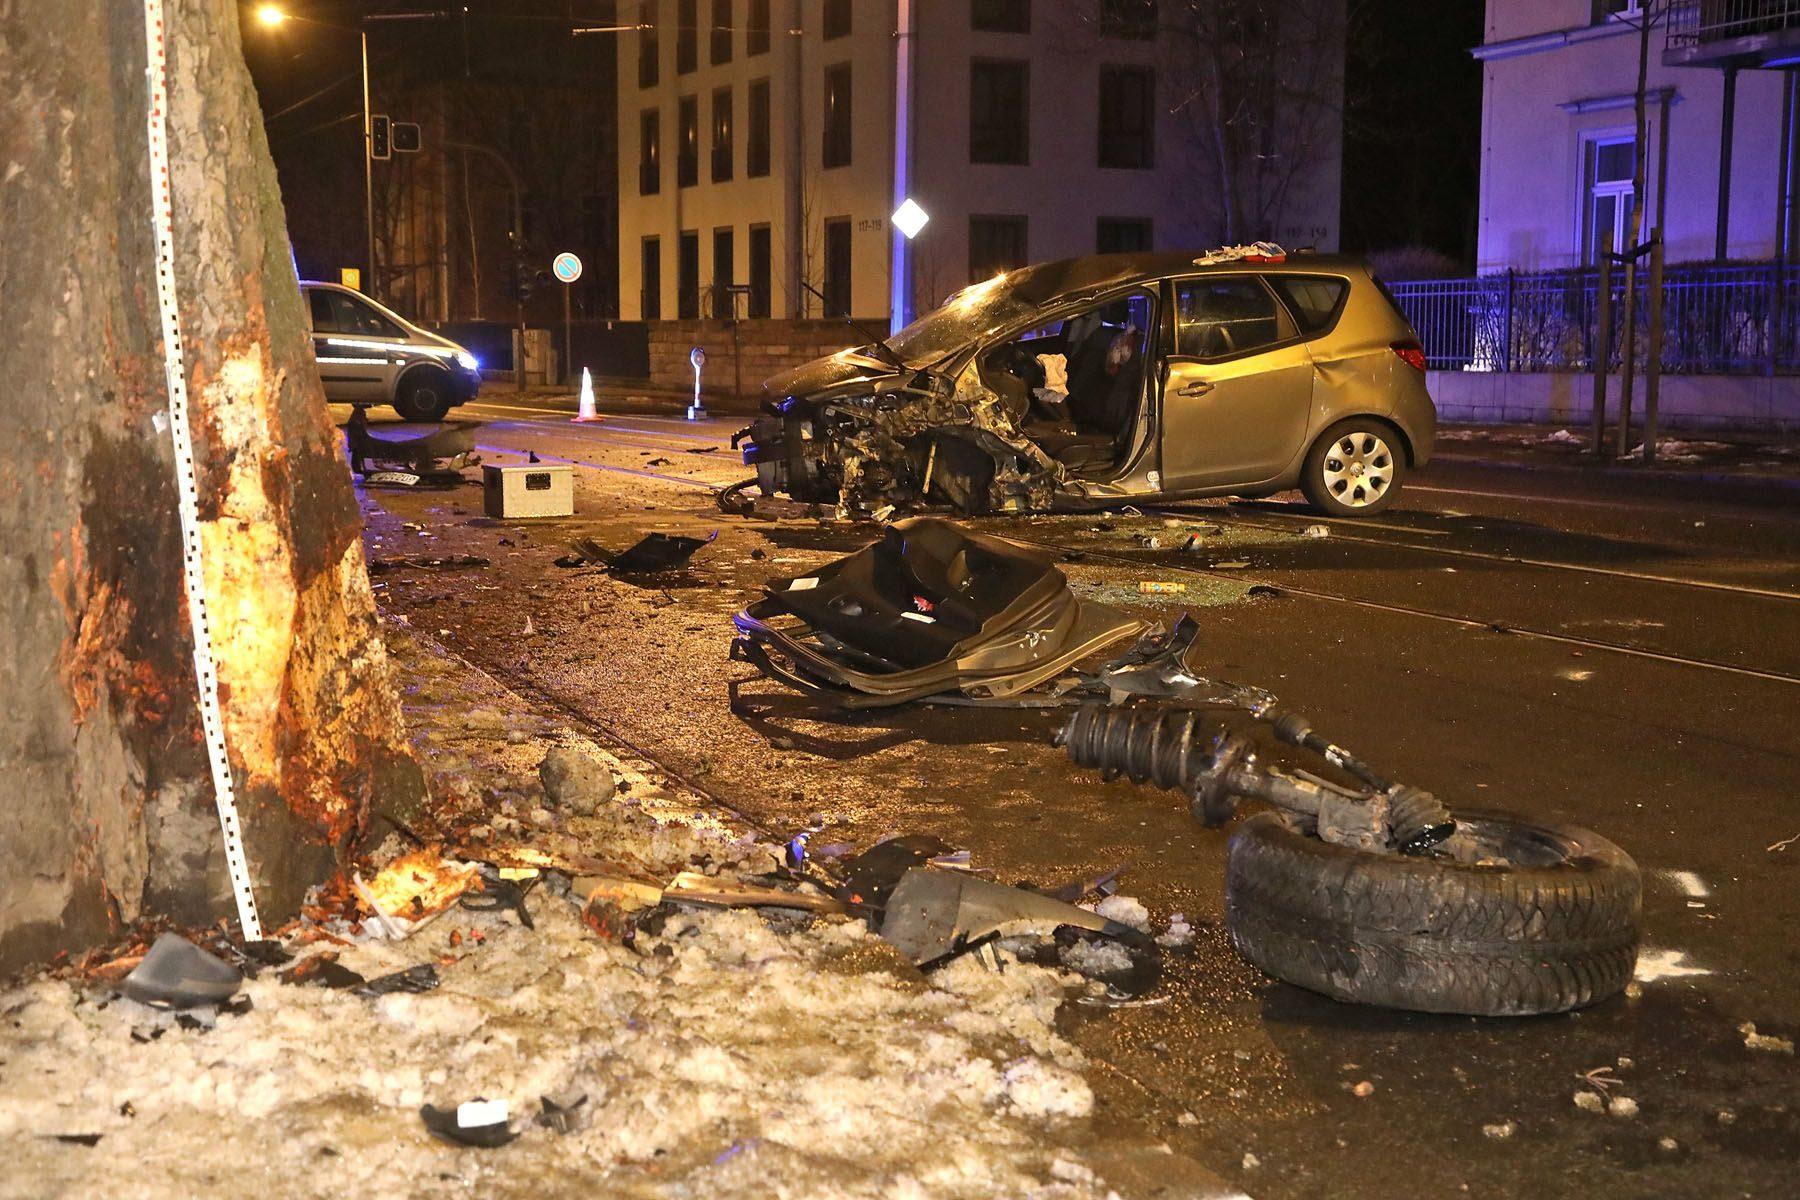 Totalschaden an dem Minivan. Foto: Roland Halkasch